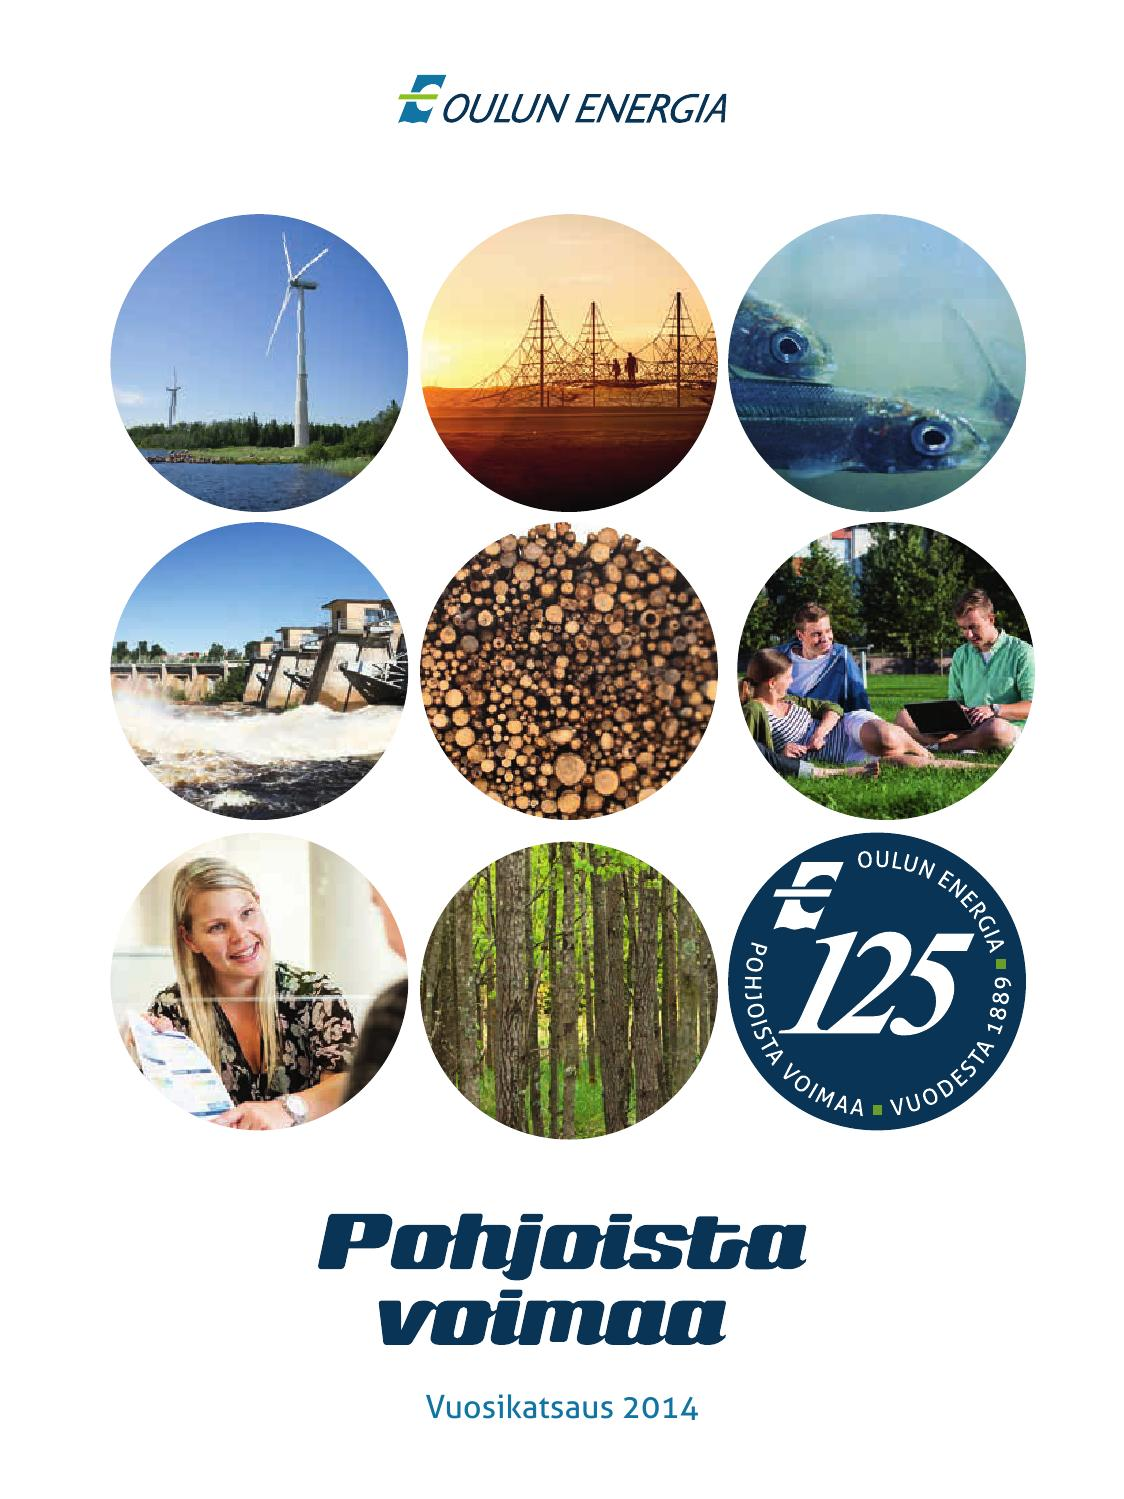 Oulun Energian vuosikatsaus 2014 by Oulun Energia - Issuu